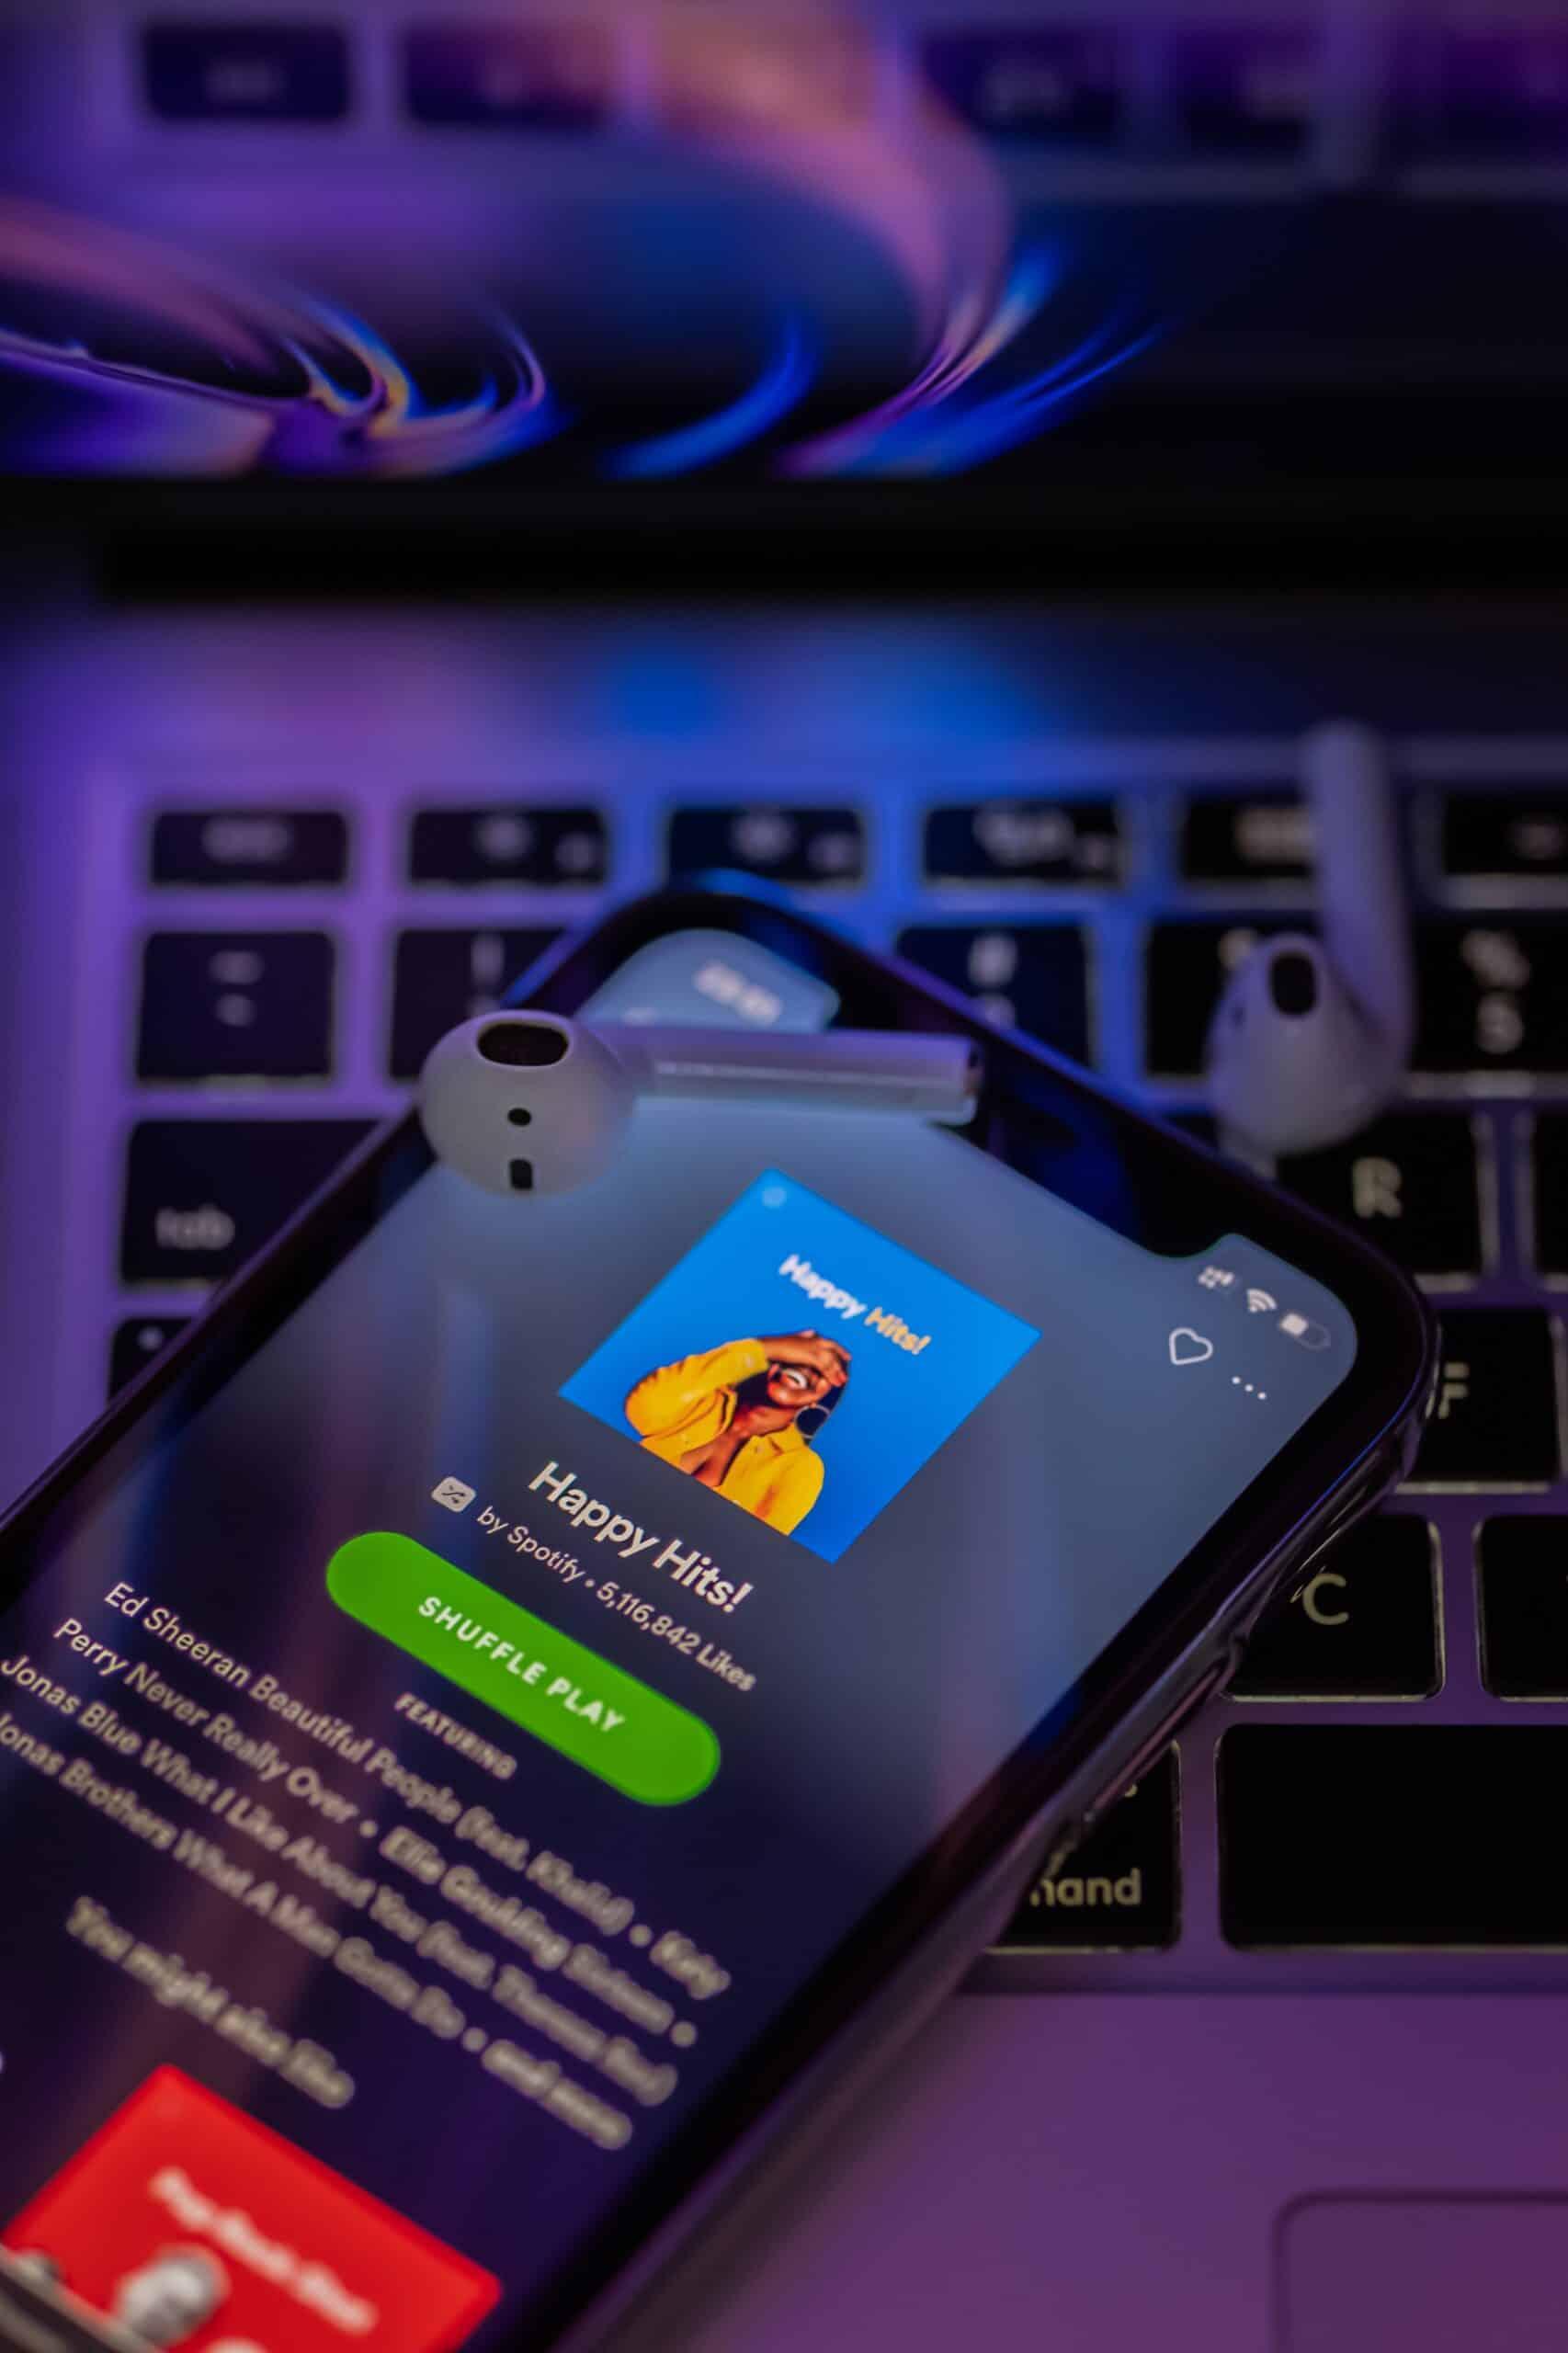 Anda Ada Lagu, Tapi Tak Tahu Bagaimana Untuk Masukkan Lagu Dalam Spotify?